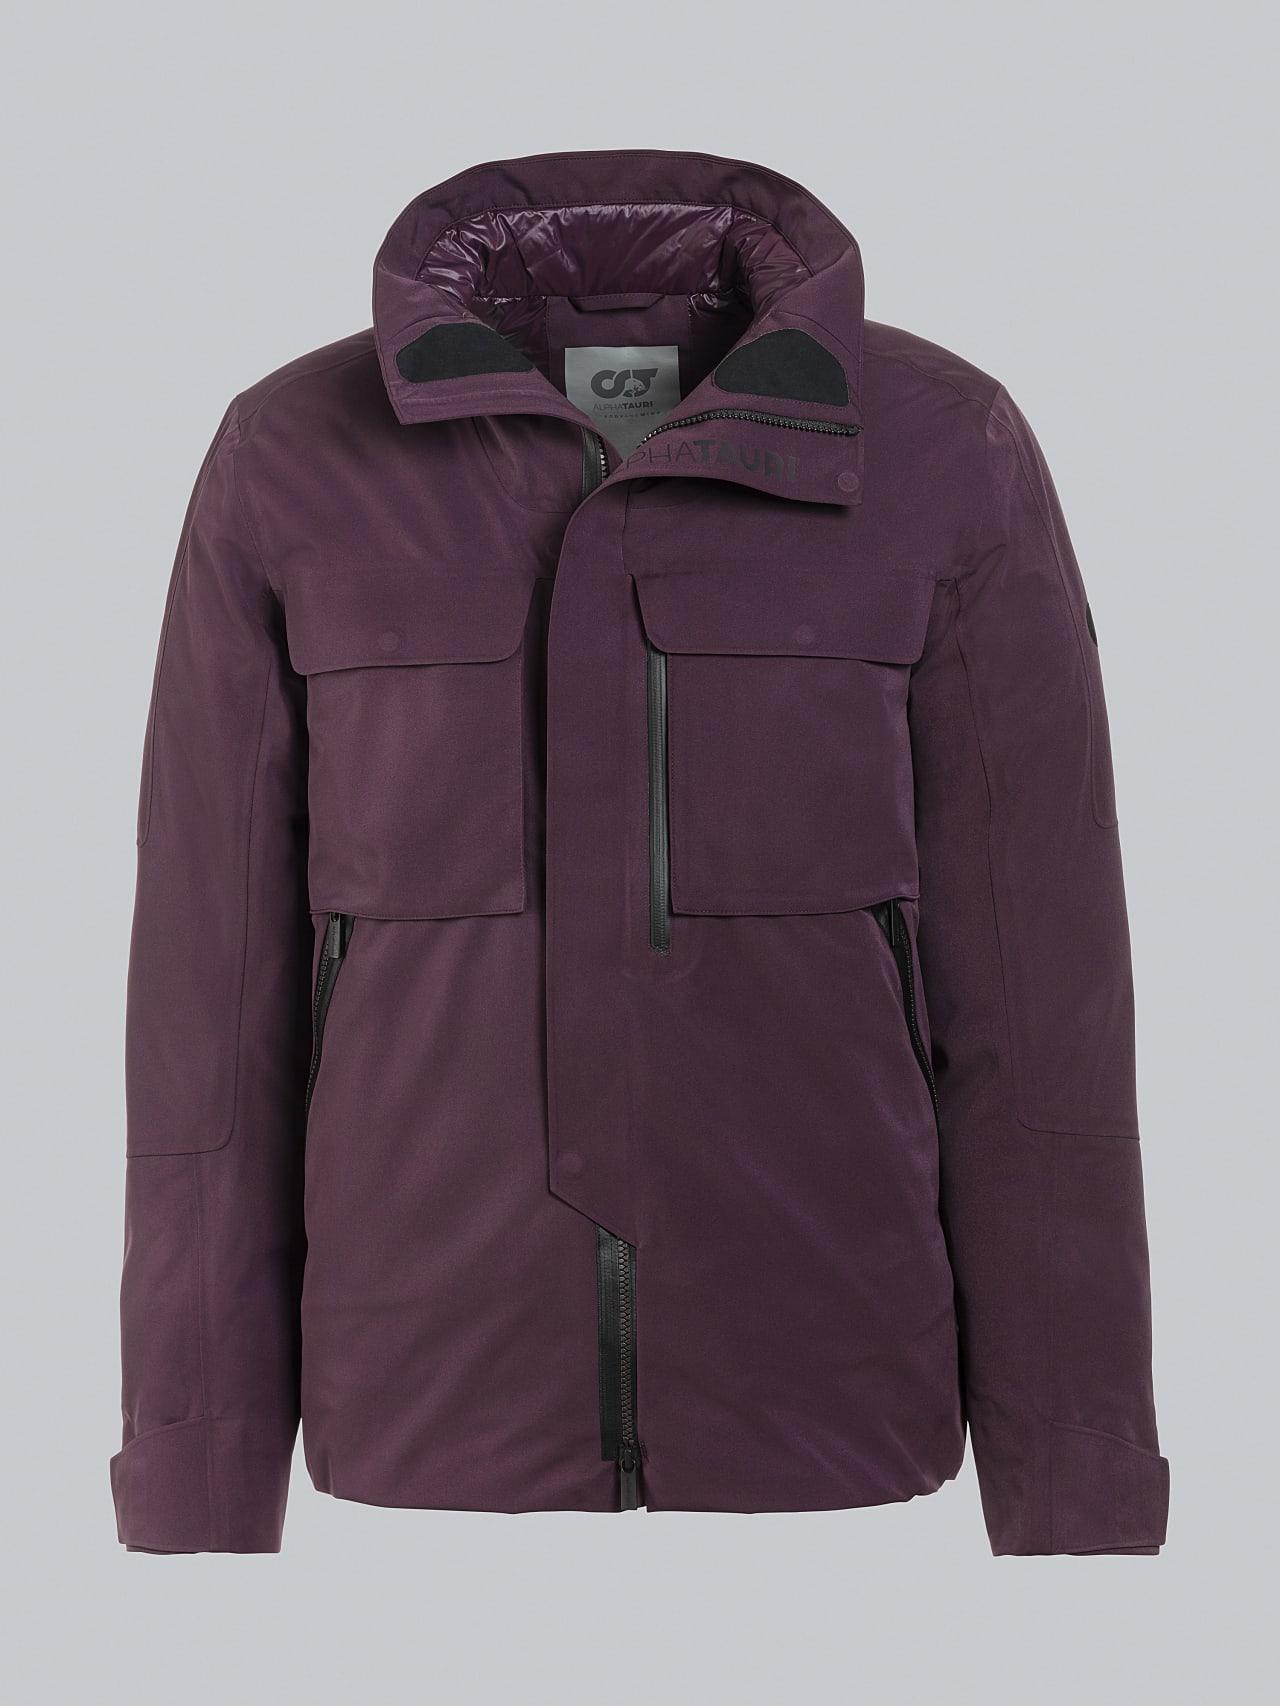 OKOVO V4.Y5.02 Packable and Waterproof Winter Jacket Burgundy Back Alpha Tauri